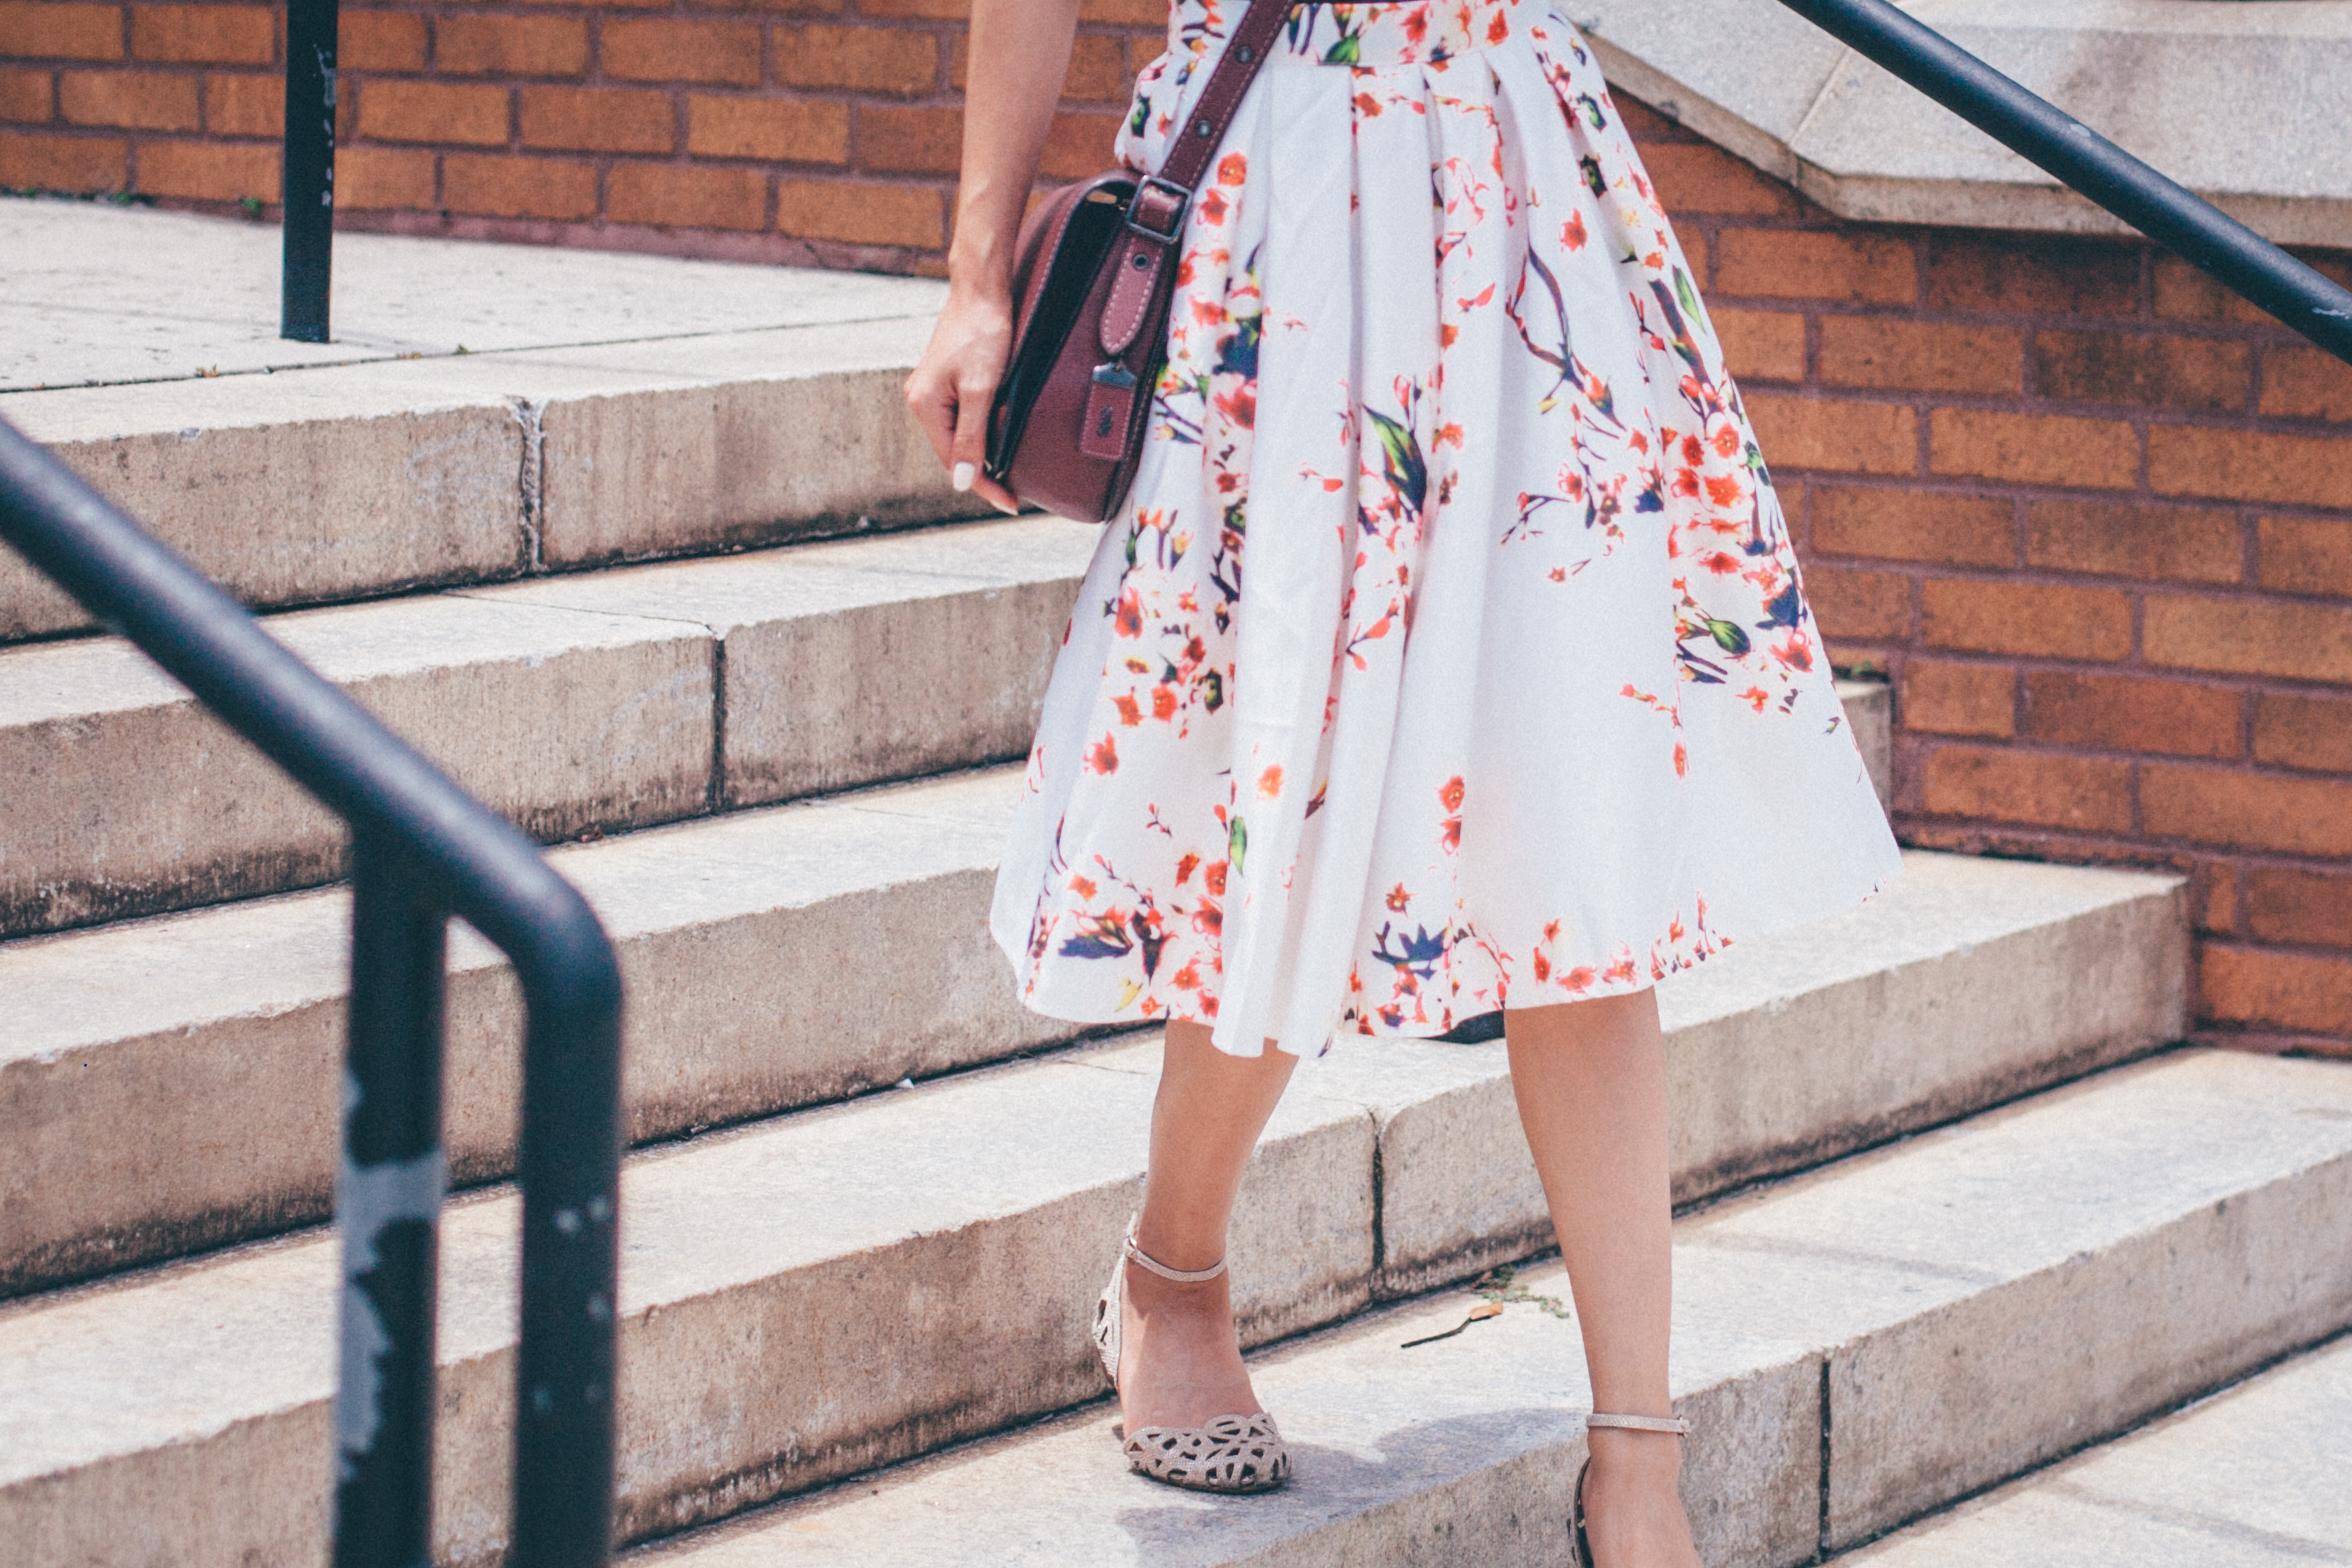 This Jenn Girl - Shein Floral Skirt 3